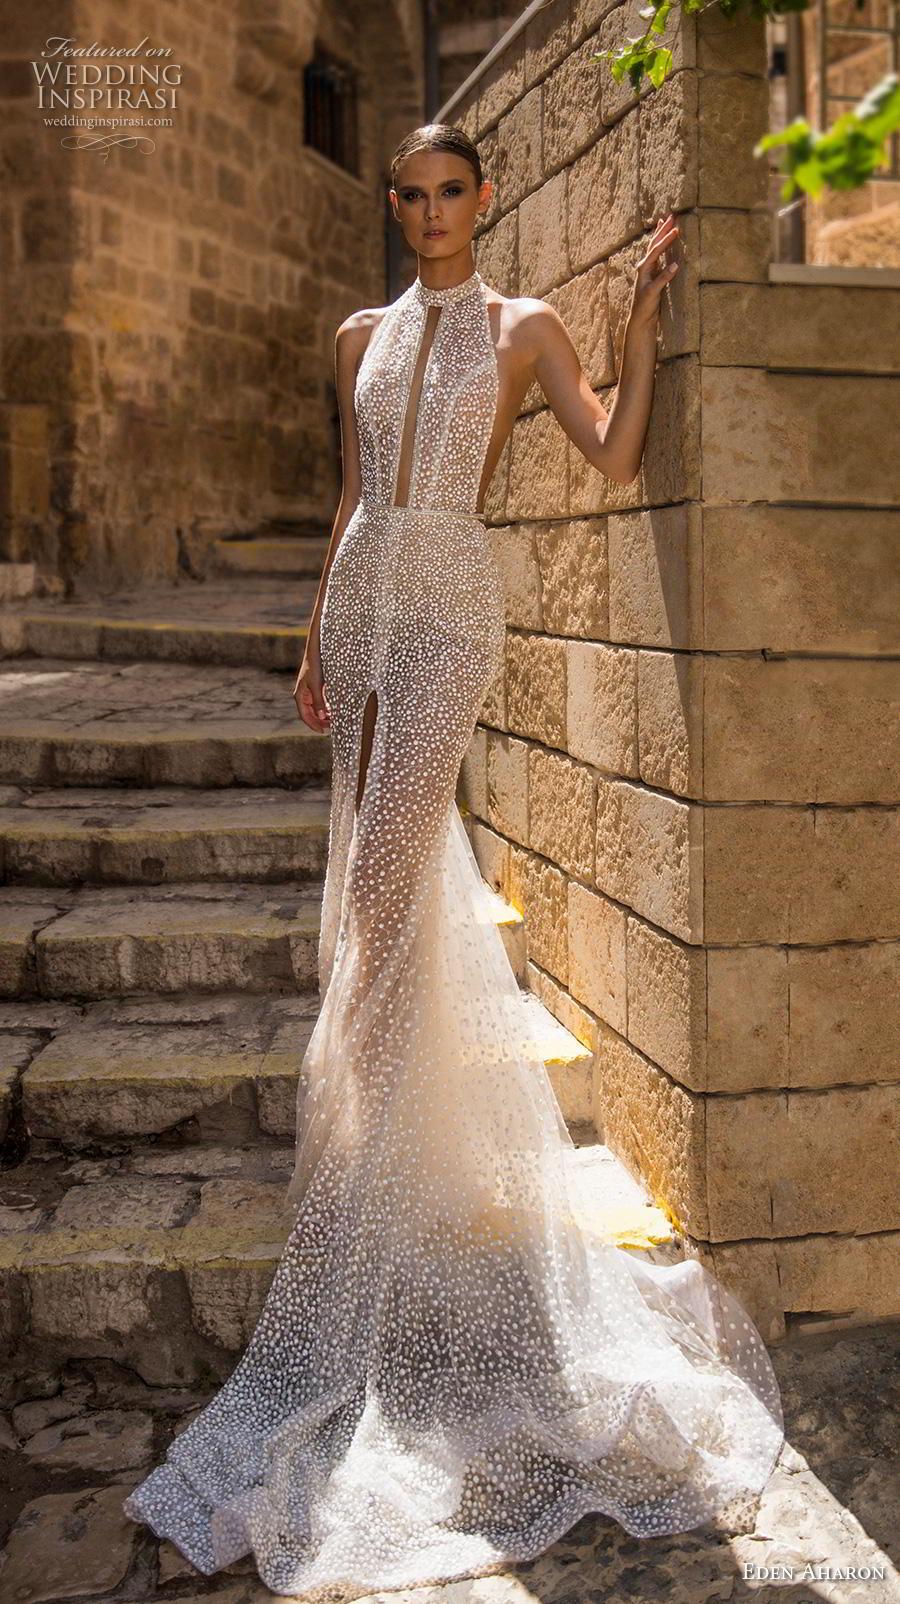 eden aharon 2019 bridal sleeveless halter jewel neck keyhole bodice full embellishment slit skirt glamorous sexy fit and flare wedding dress low open back chapel train (10) mv